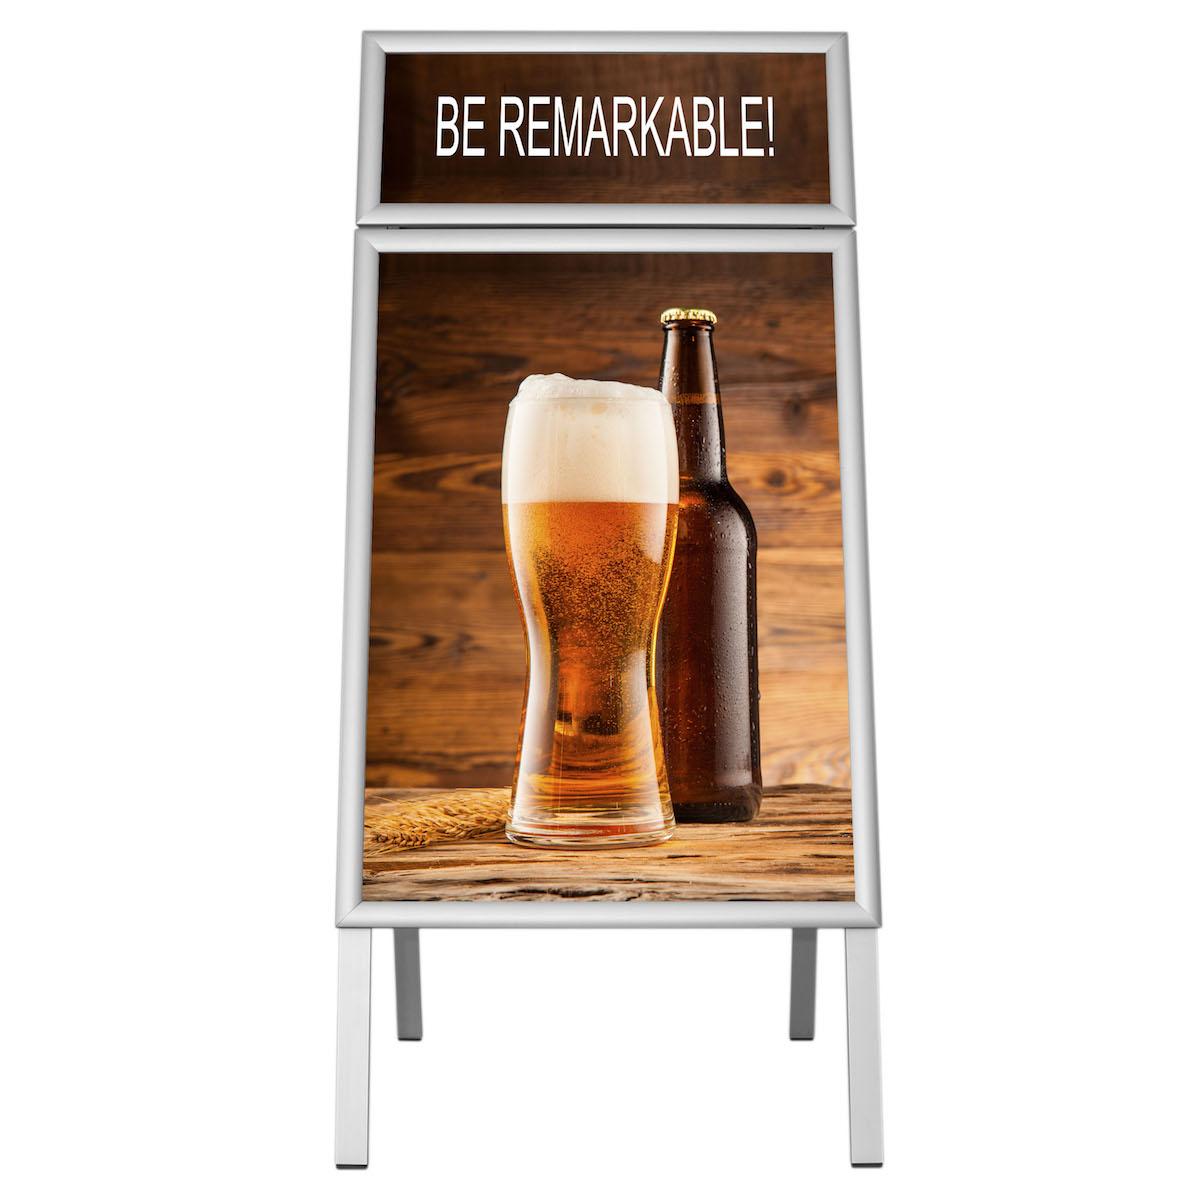 People Stopper Double Frame, A board din profil aluminiu click  25mm cu colt la 45 grade S5, JJ DISPLAYS, 500 x 700 mm